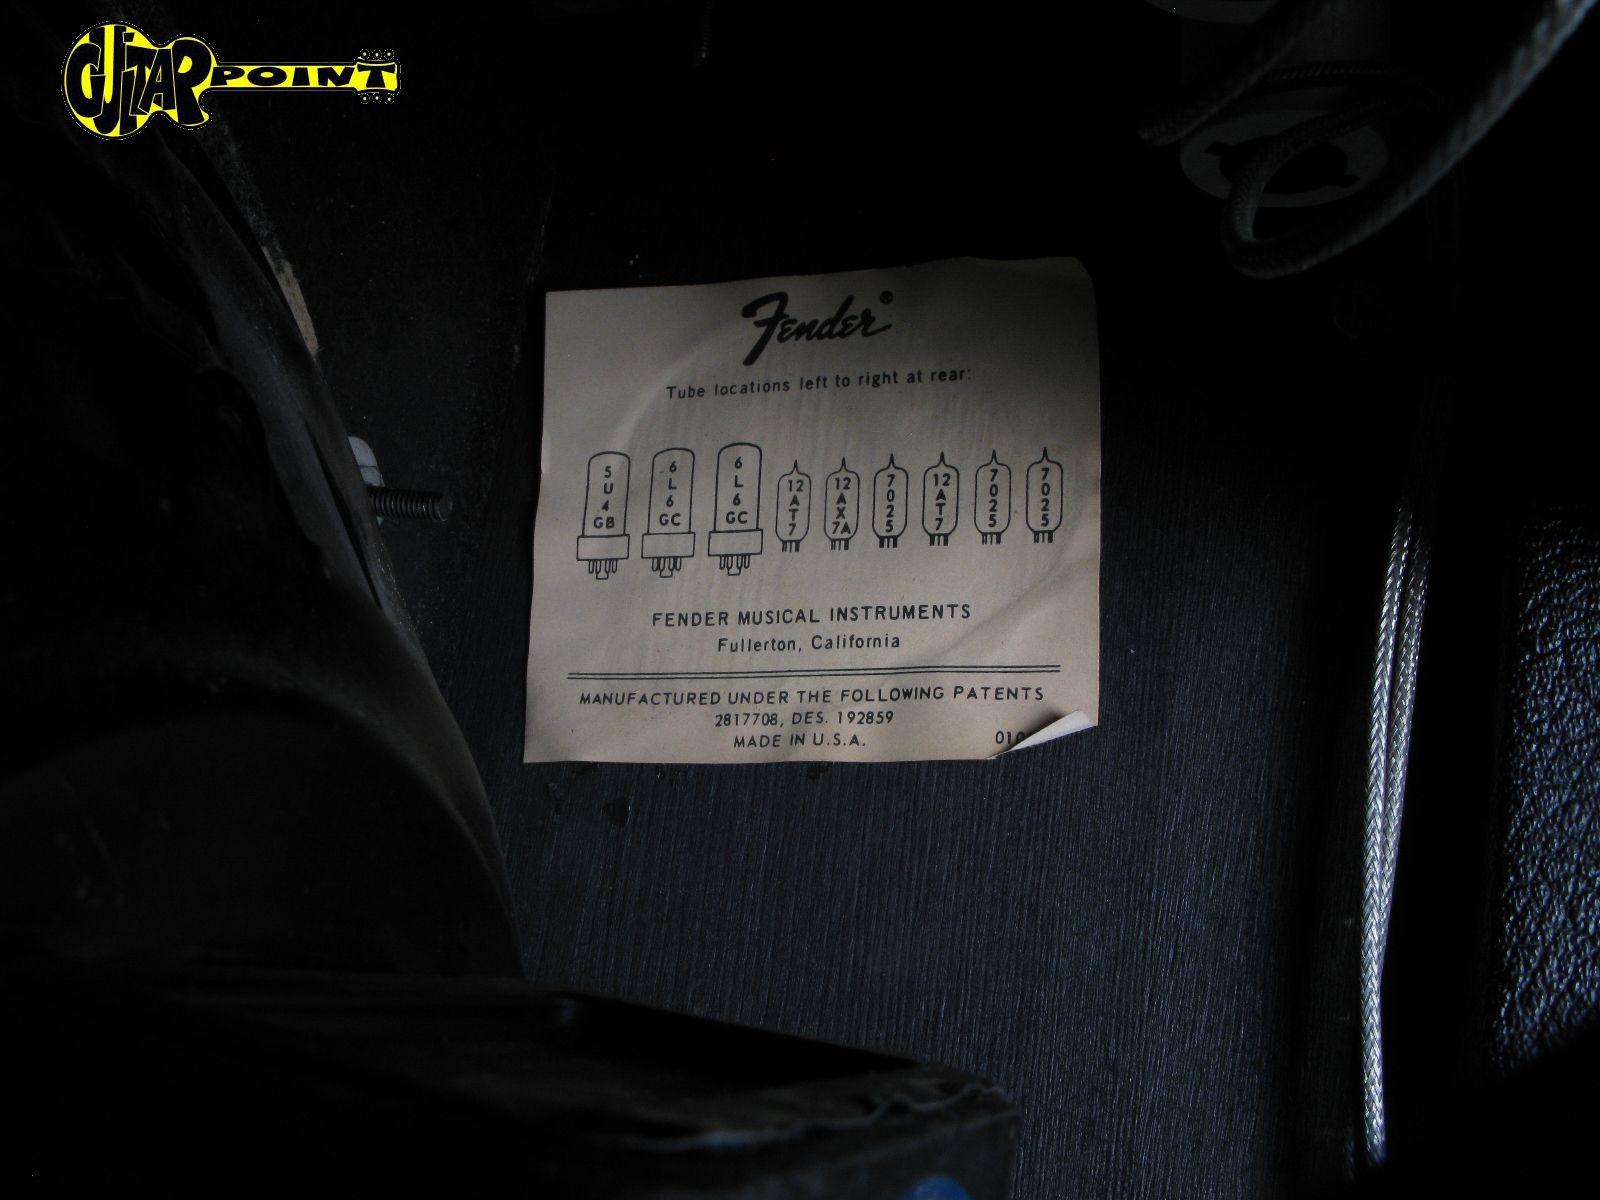 https://guitarpoint.de/app/uploads/products/1974-fender-vibrolux-reverb-amp/Fender74VibroluxA31146_11.jpg